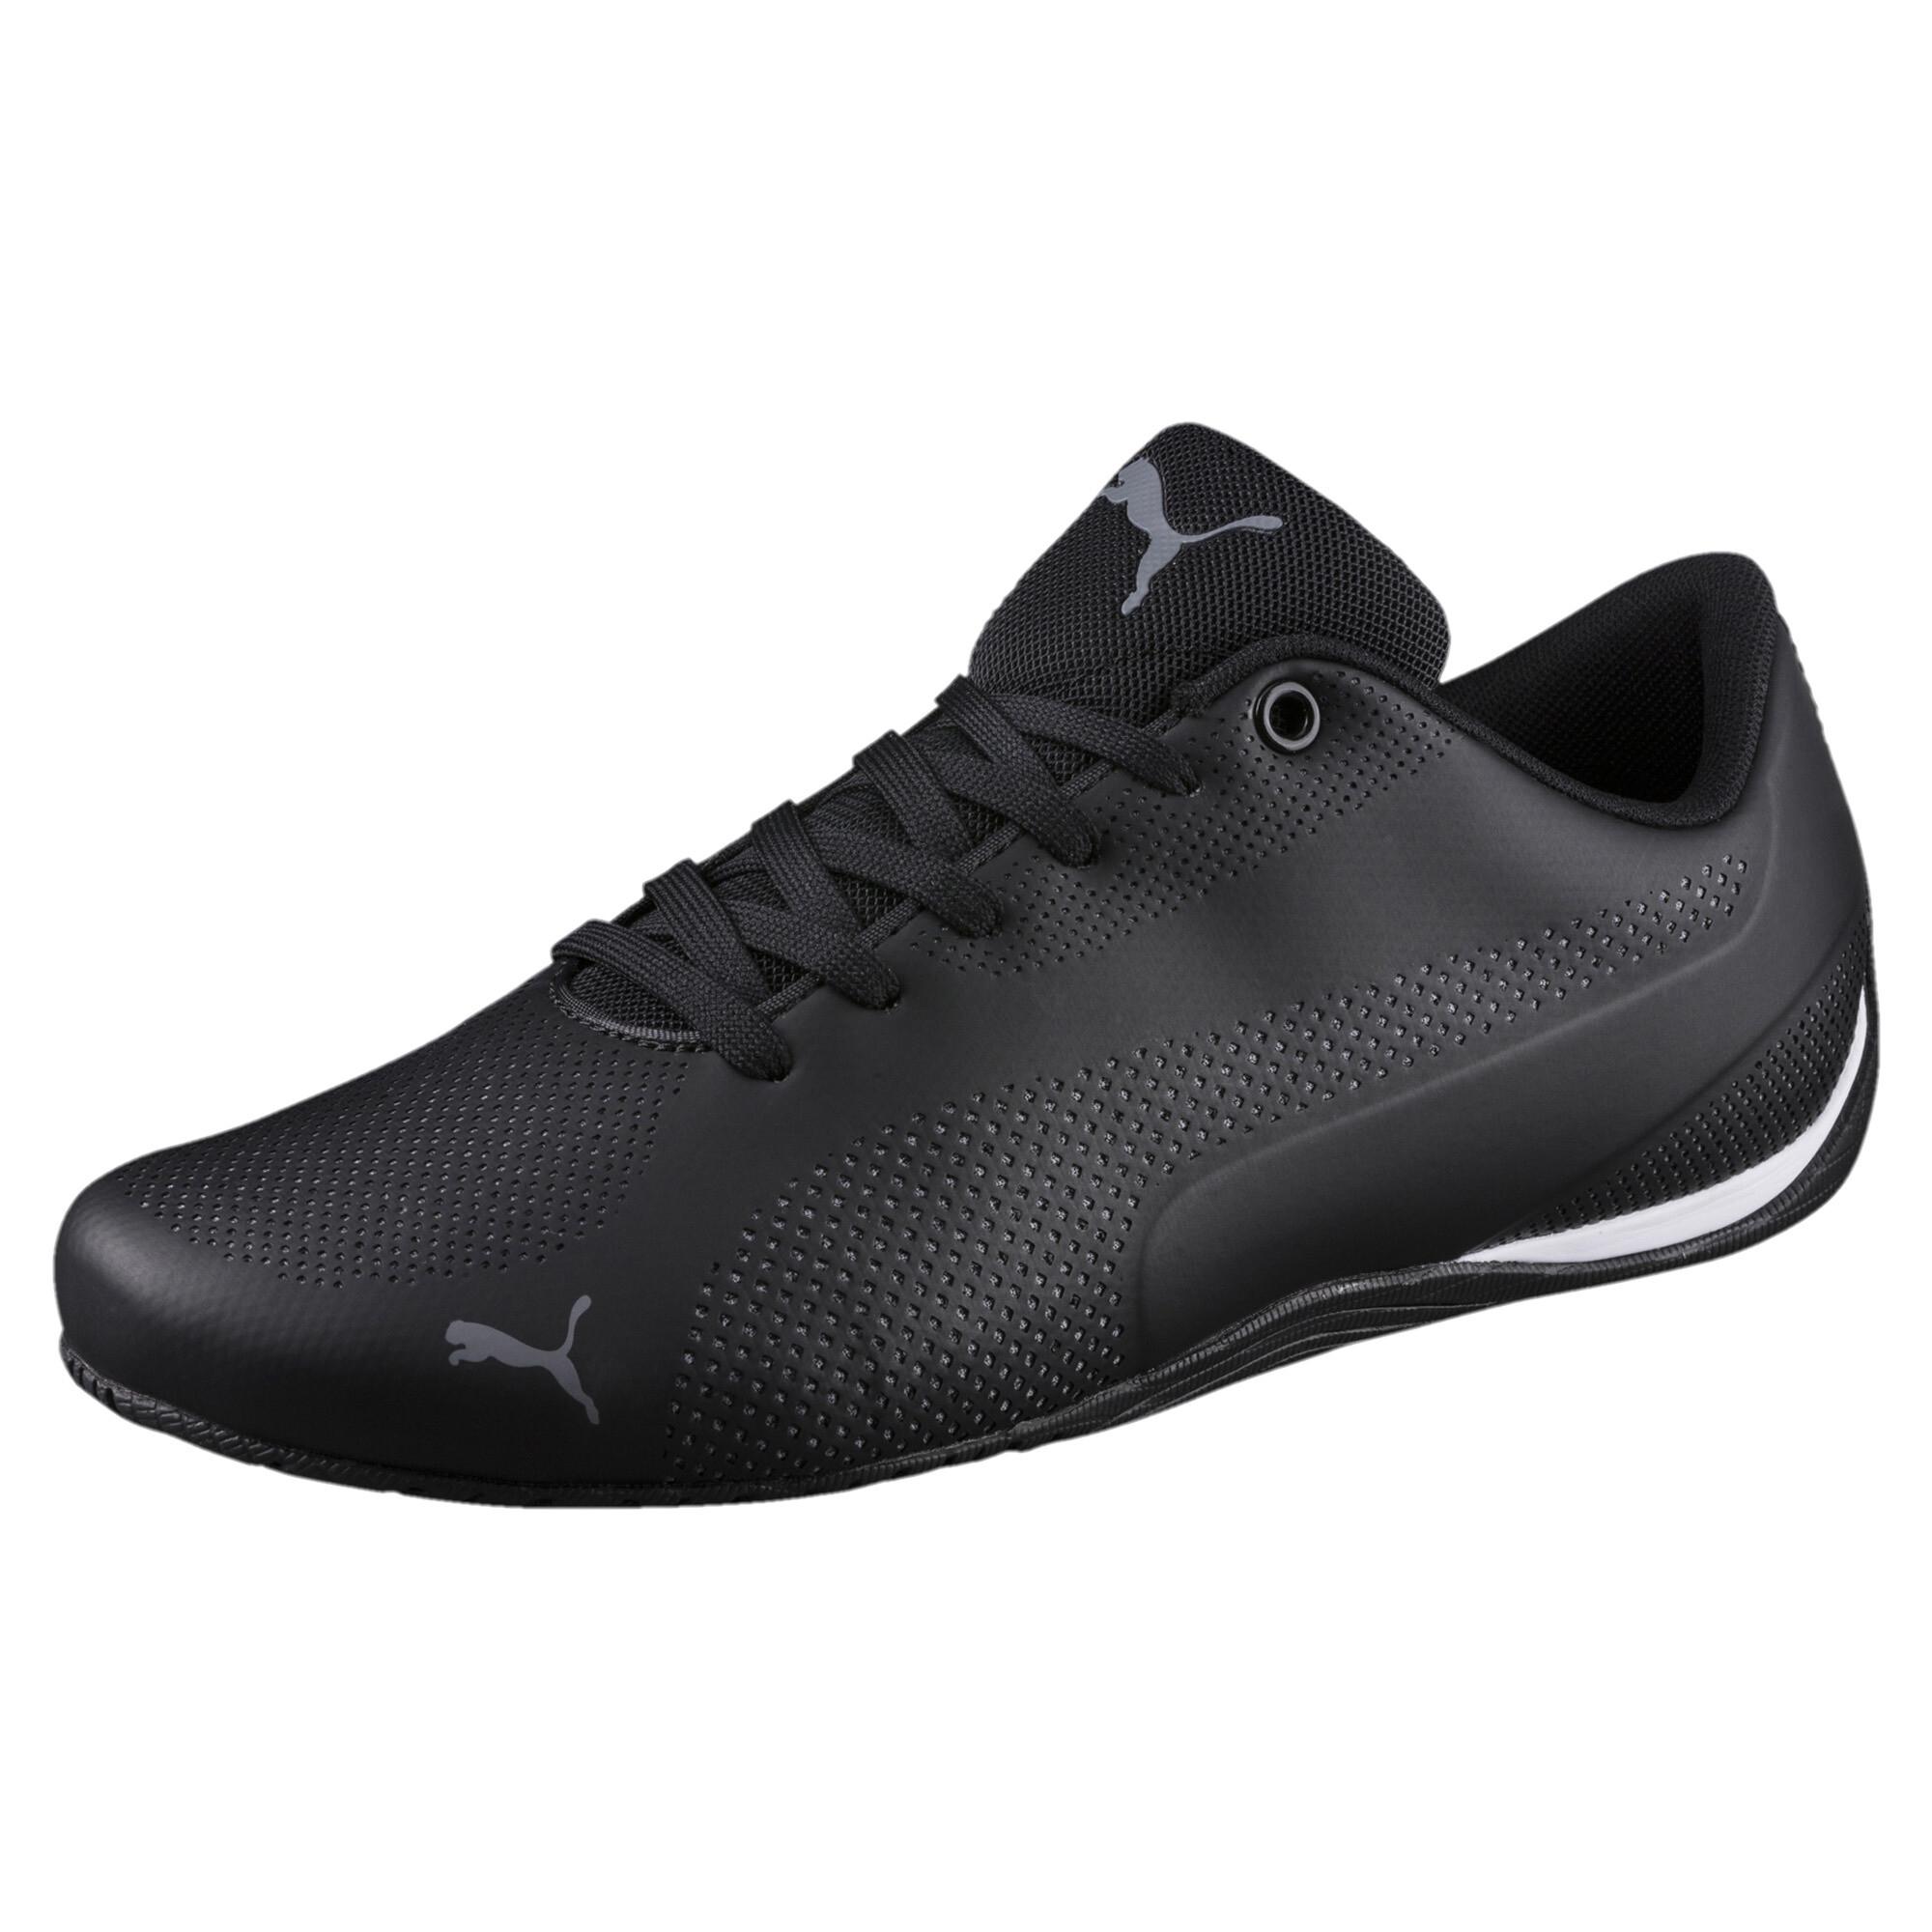 PUMA-Drift-Cat-5-Ultra-Men-s-Shoes-Men-Shoe-Sport-Classics thumbnail 4